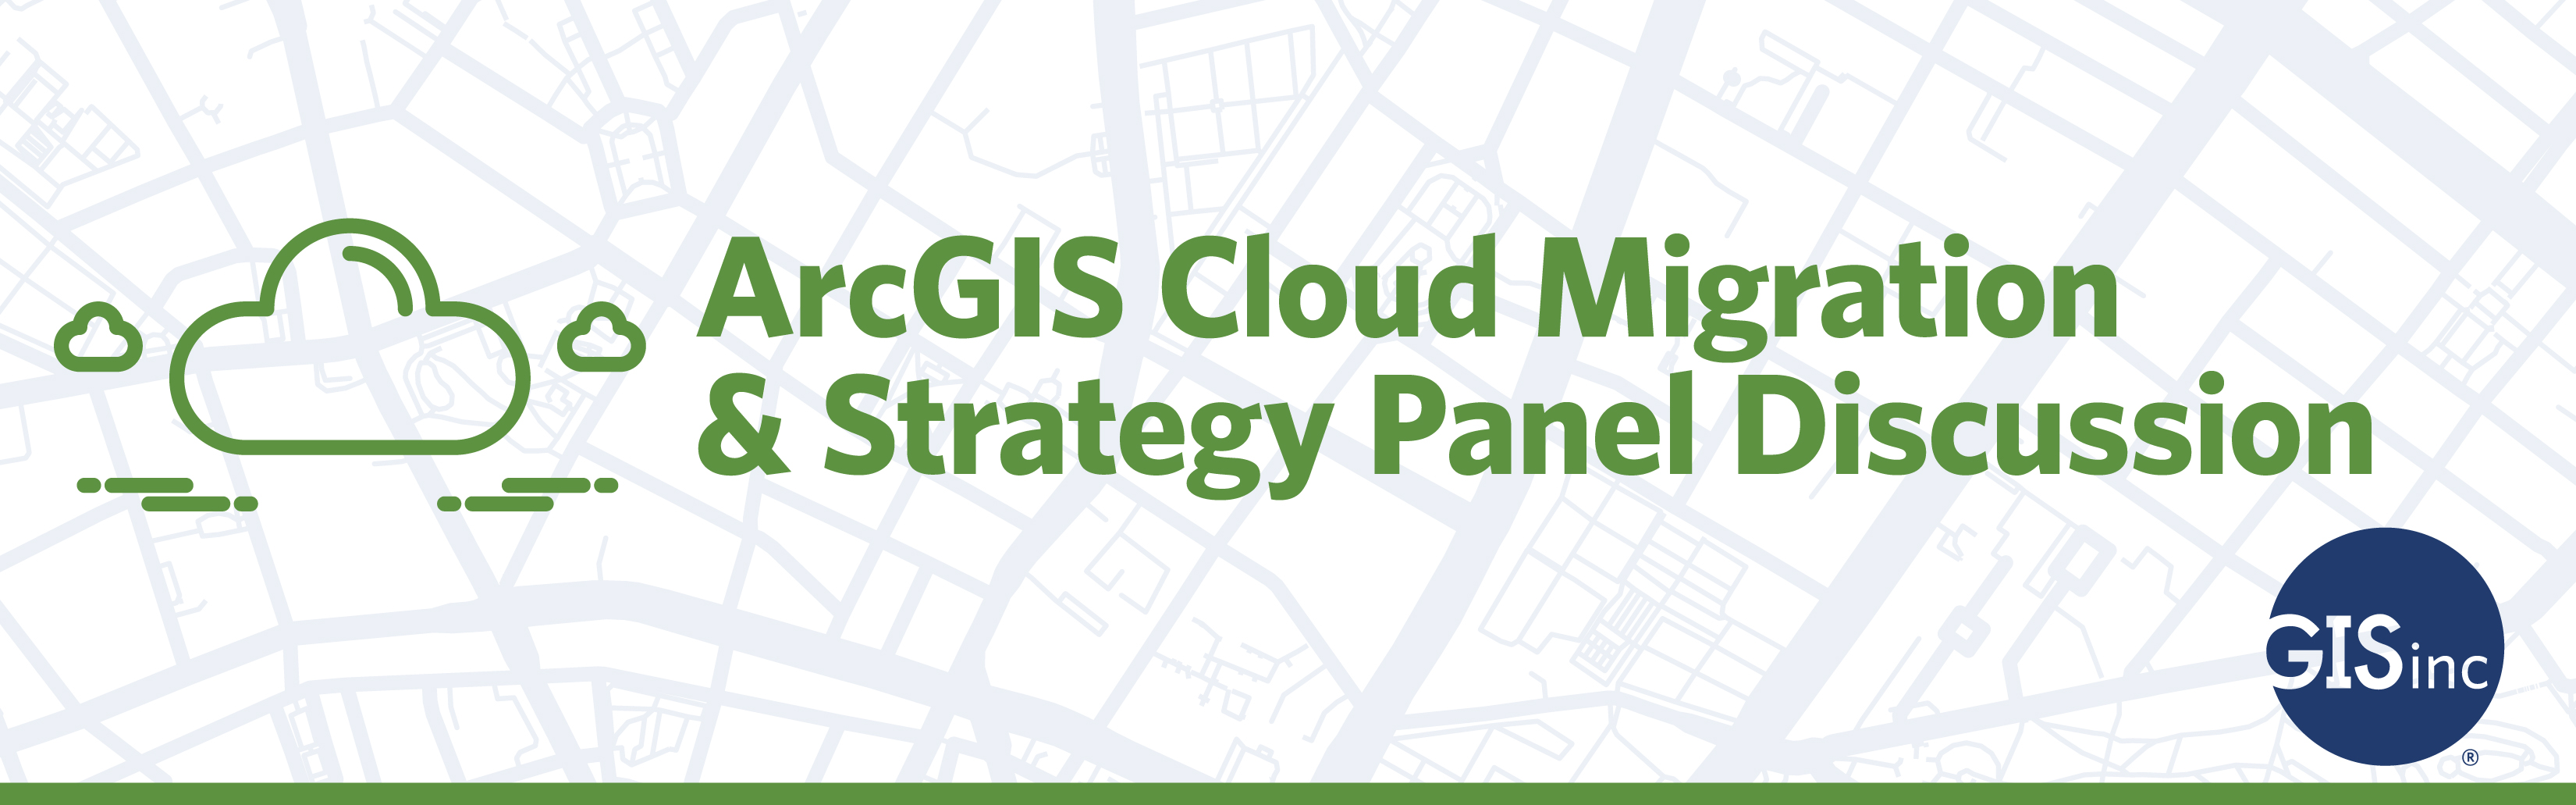 arcgis-cloud-strategy-landingPage-header-1